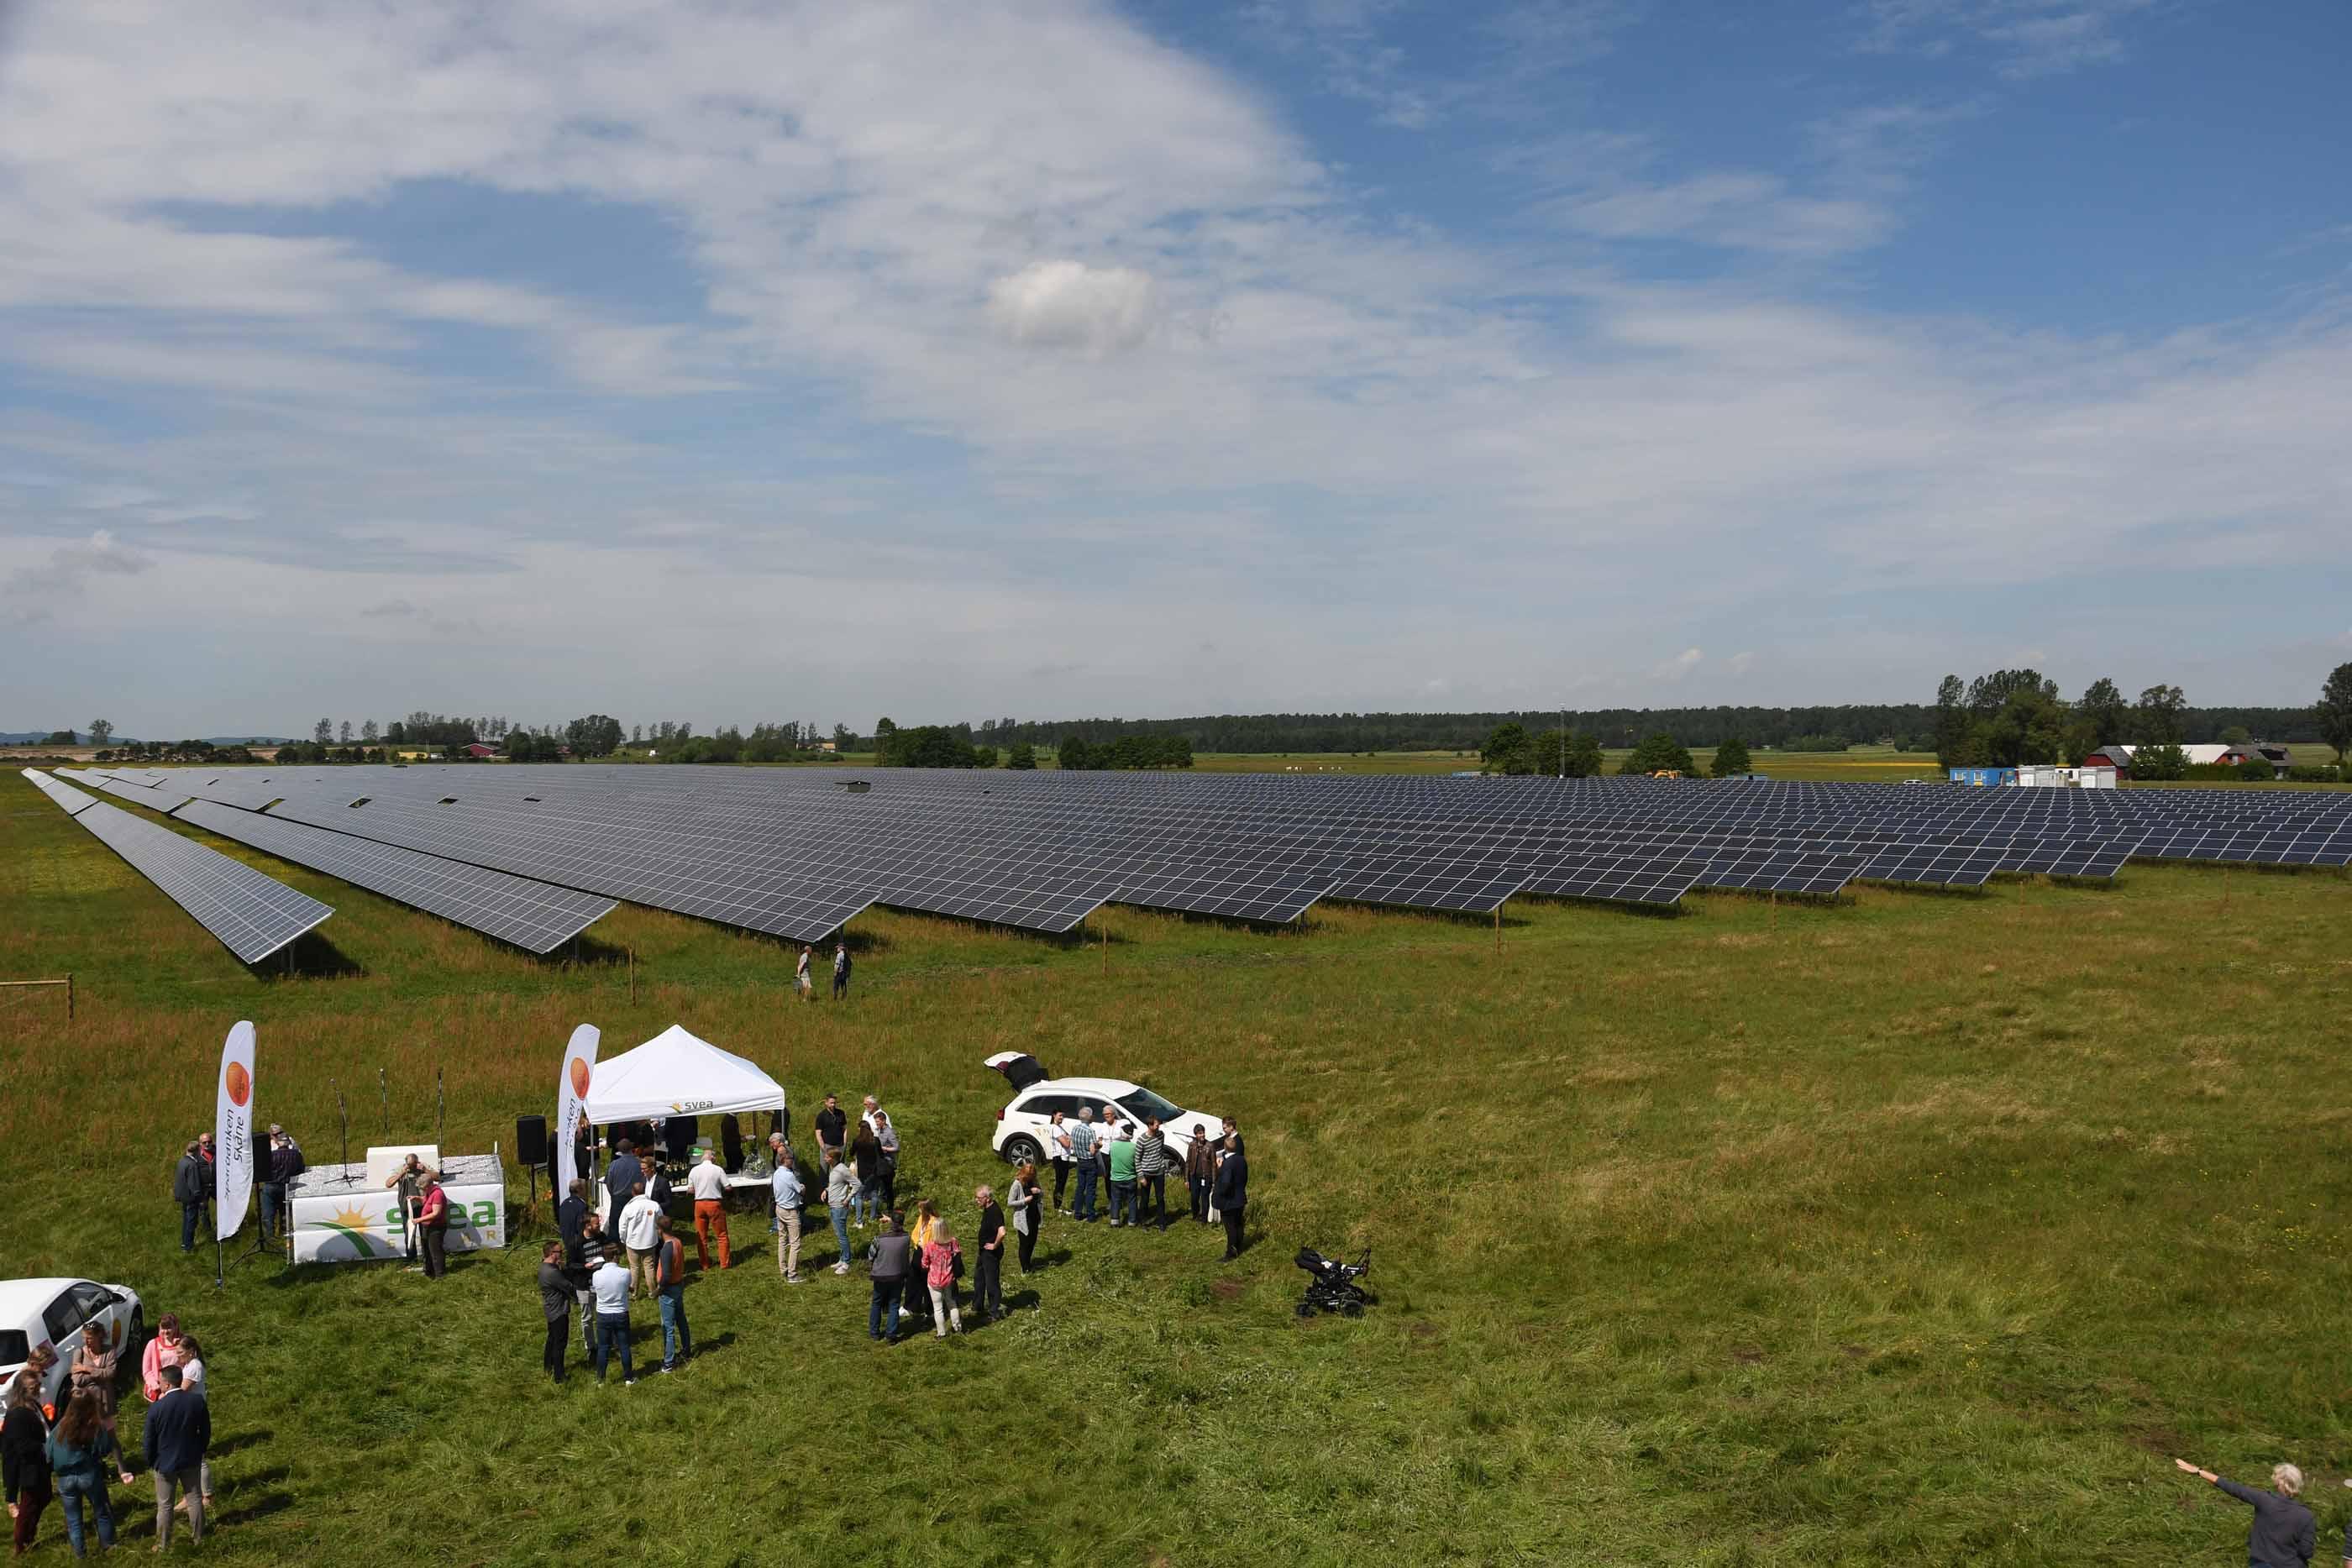 Sveriges största solcellspark invigd i Sjöbo